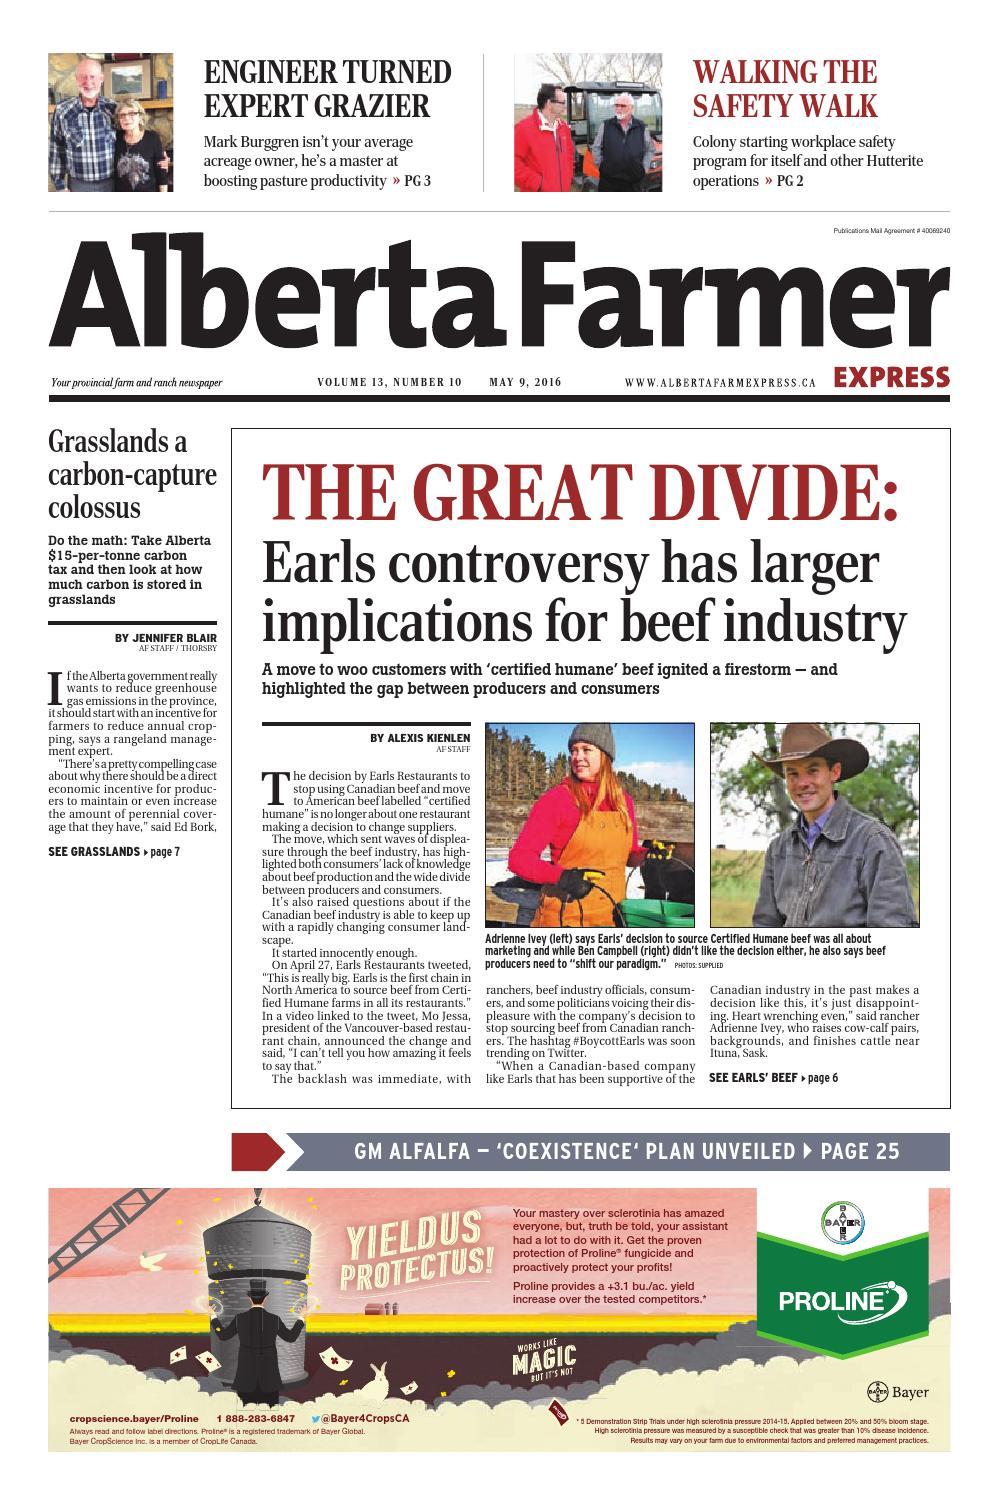 Alberta farmer express by farm business communications issuu fandeluxe Gallery